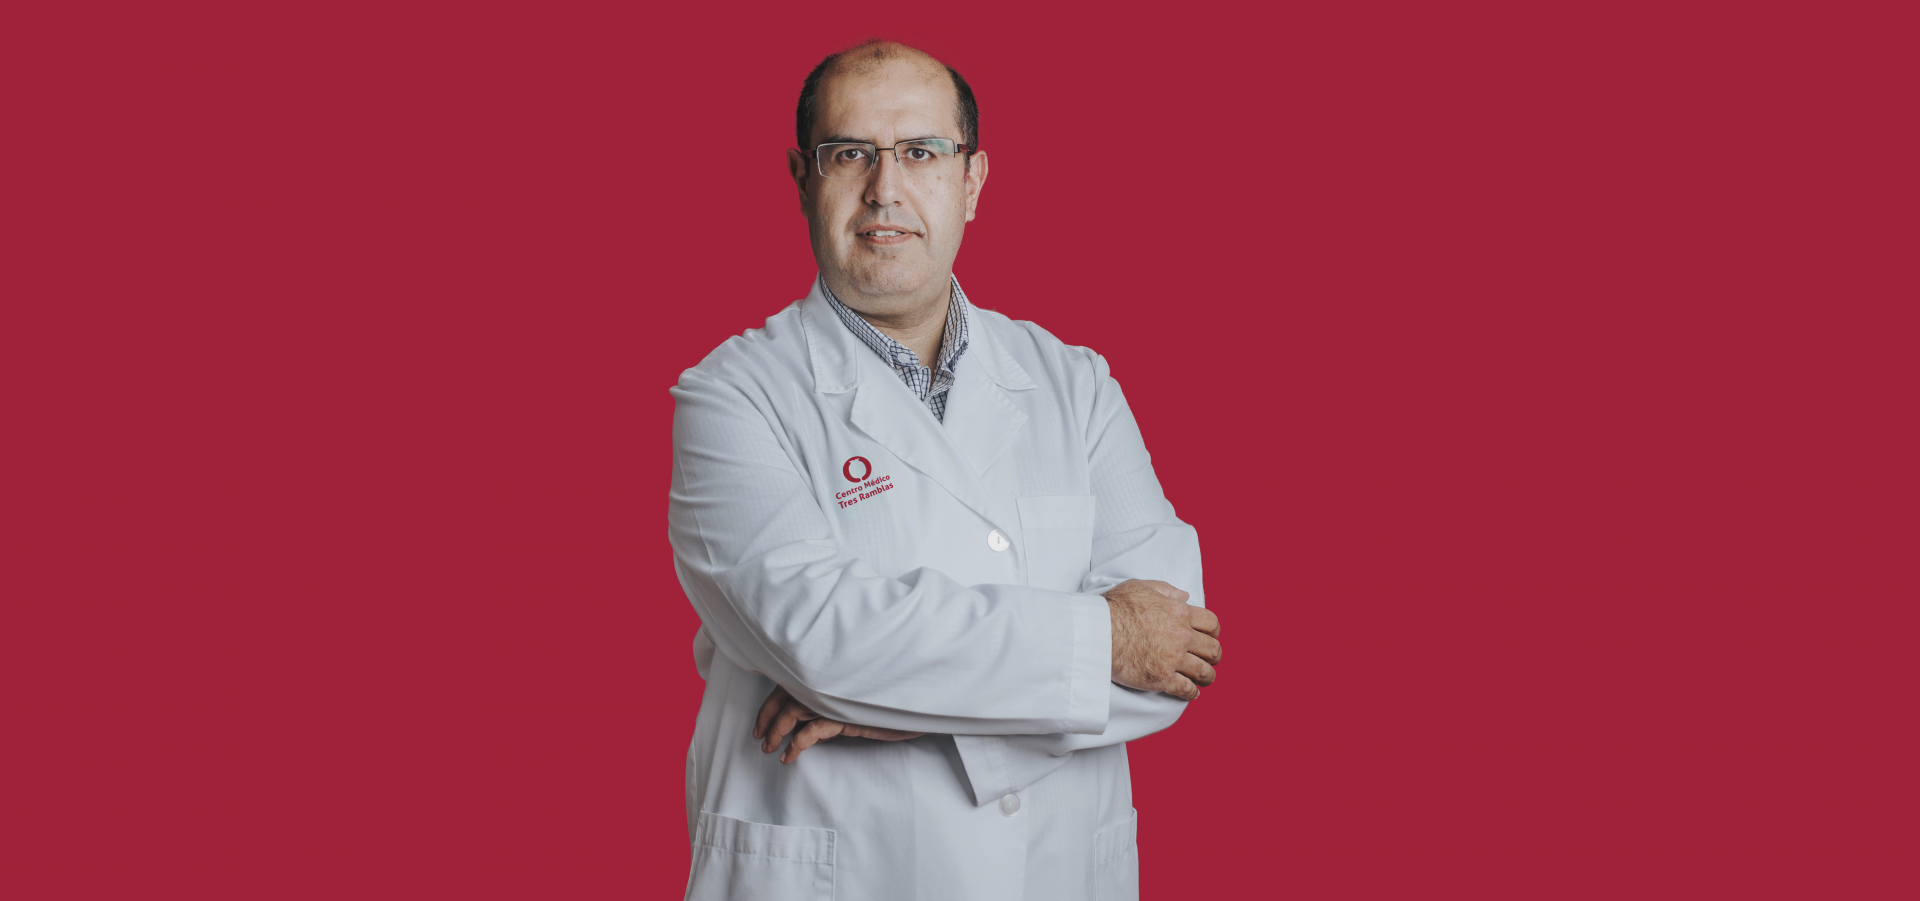 Dr. Ricardo Luis Jacinto